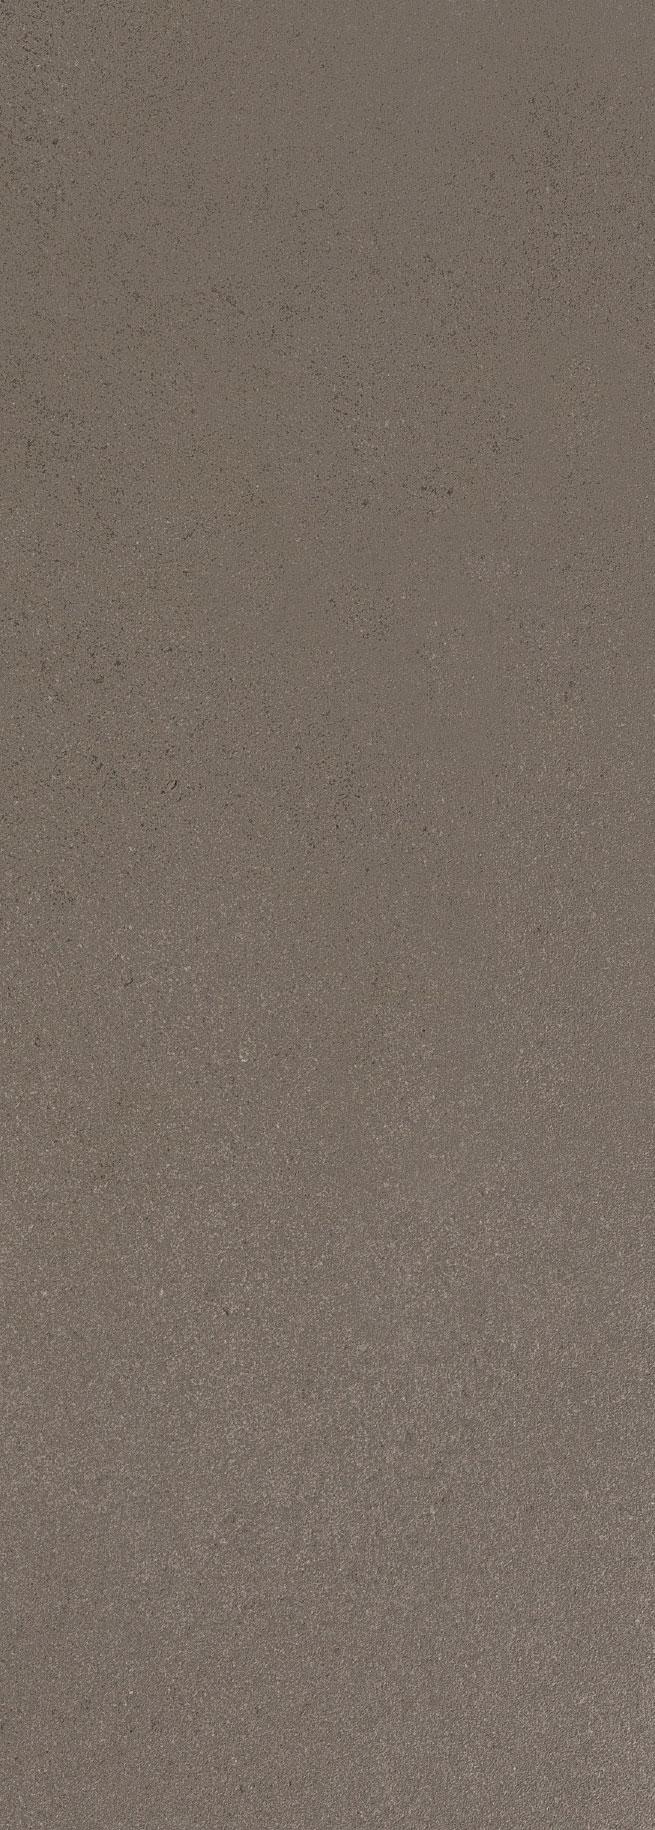 Living Ceramics Ground 45x90 Antracite-0